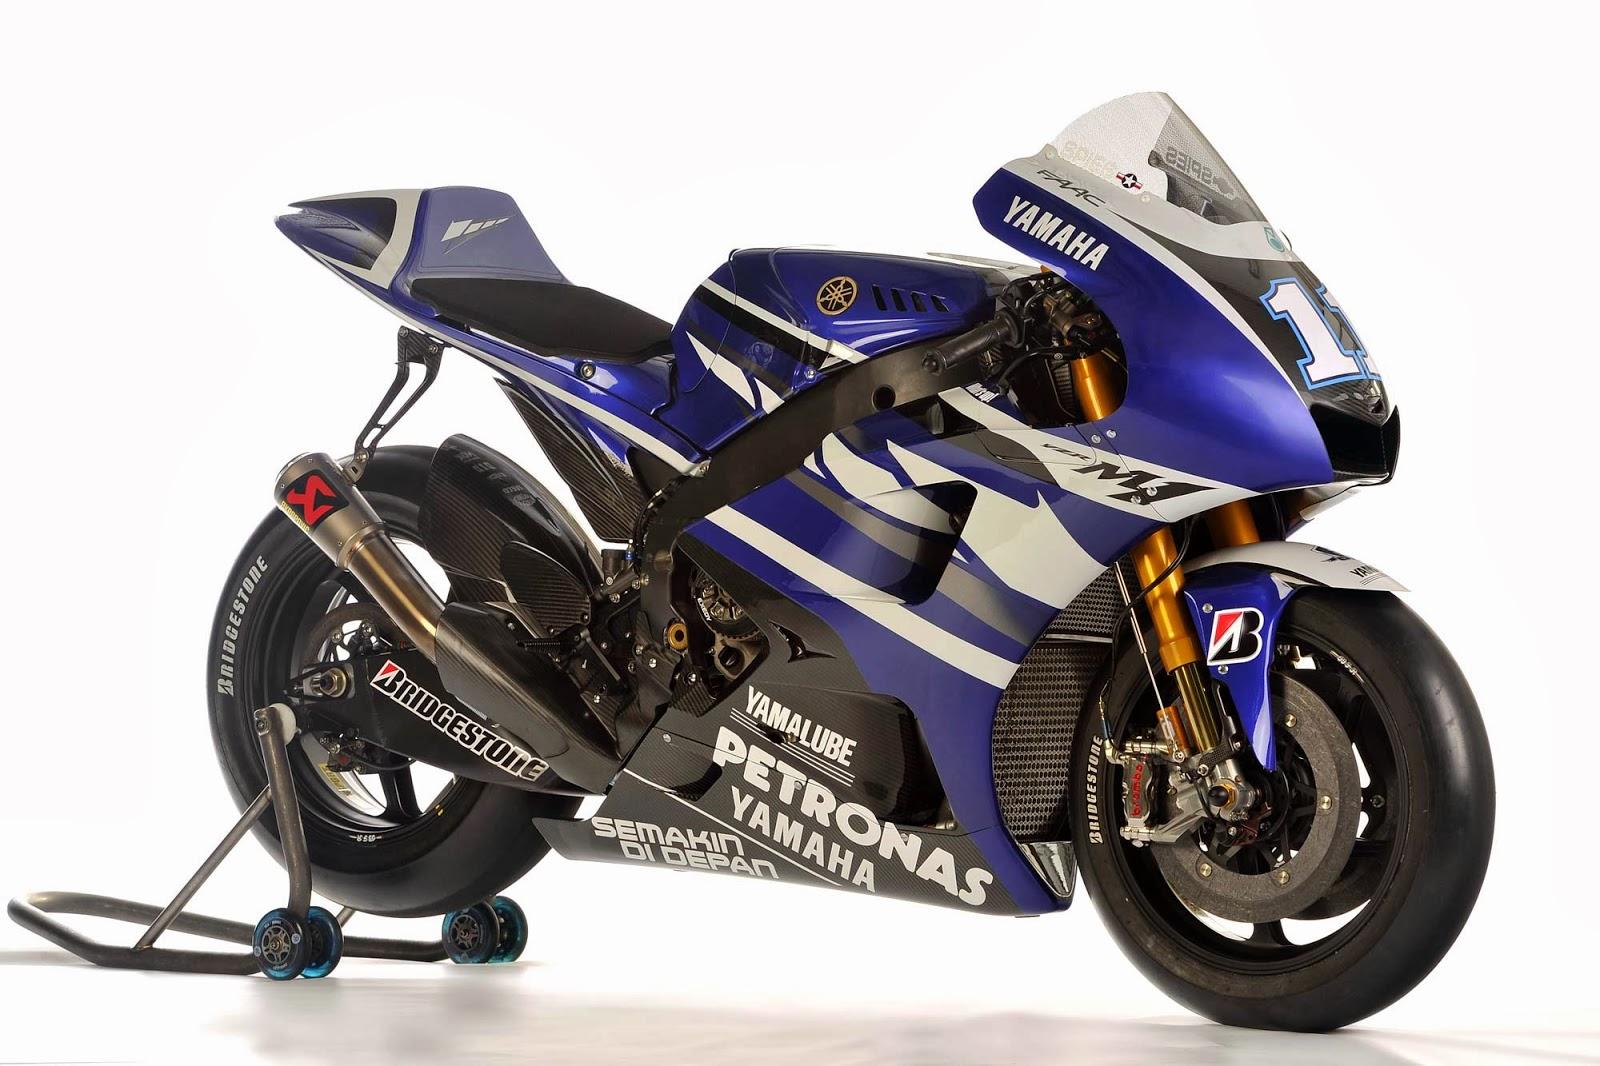 Motor Yamaha R25 Terbaru